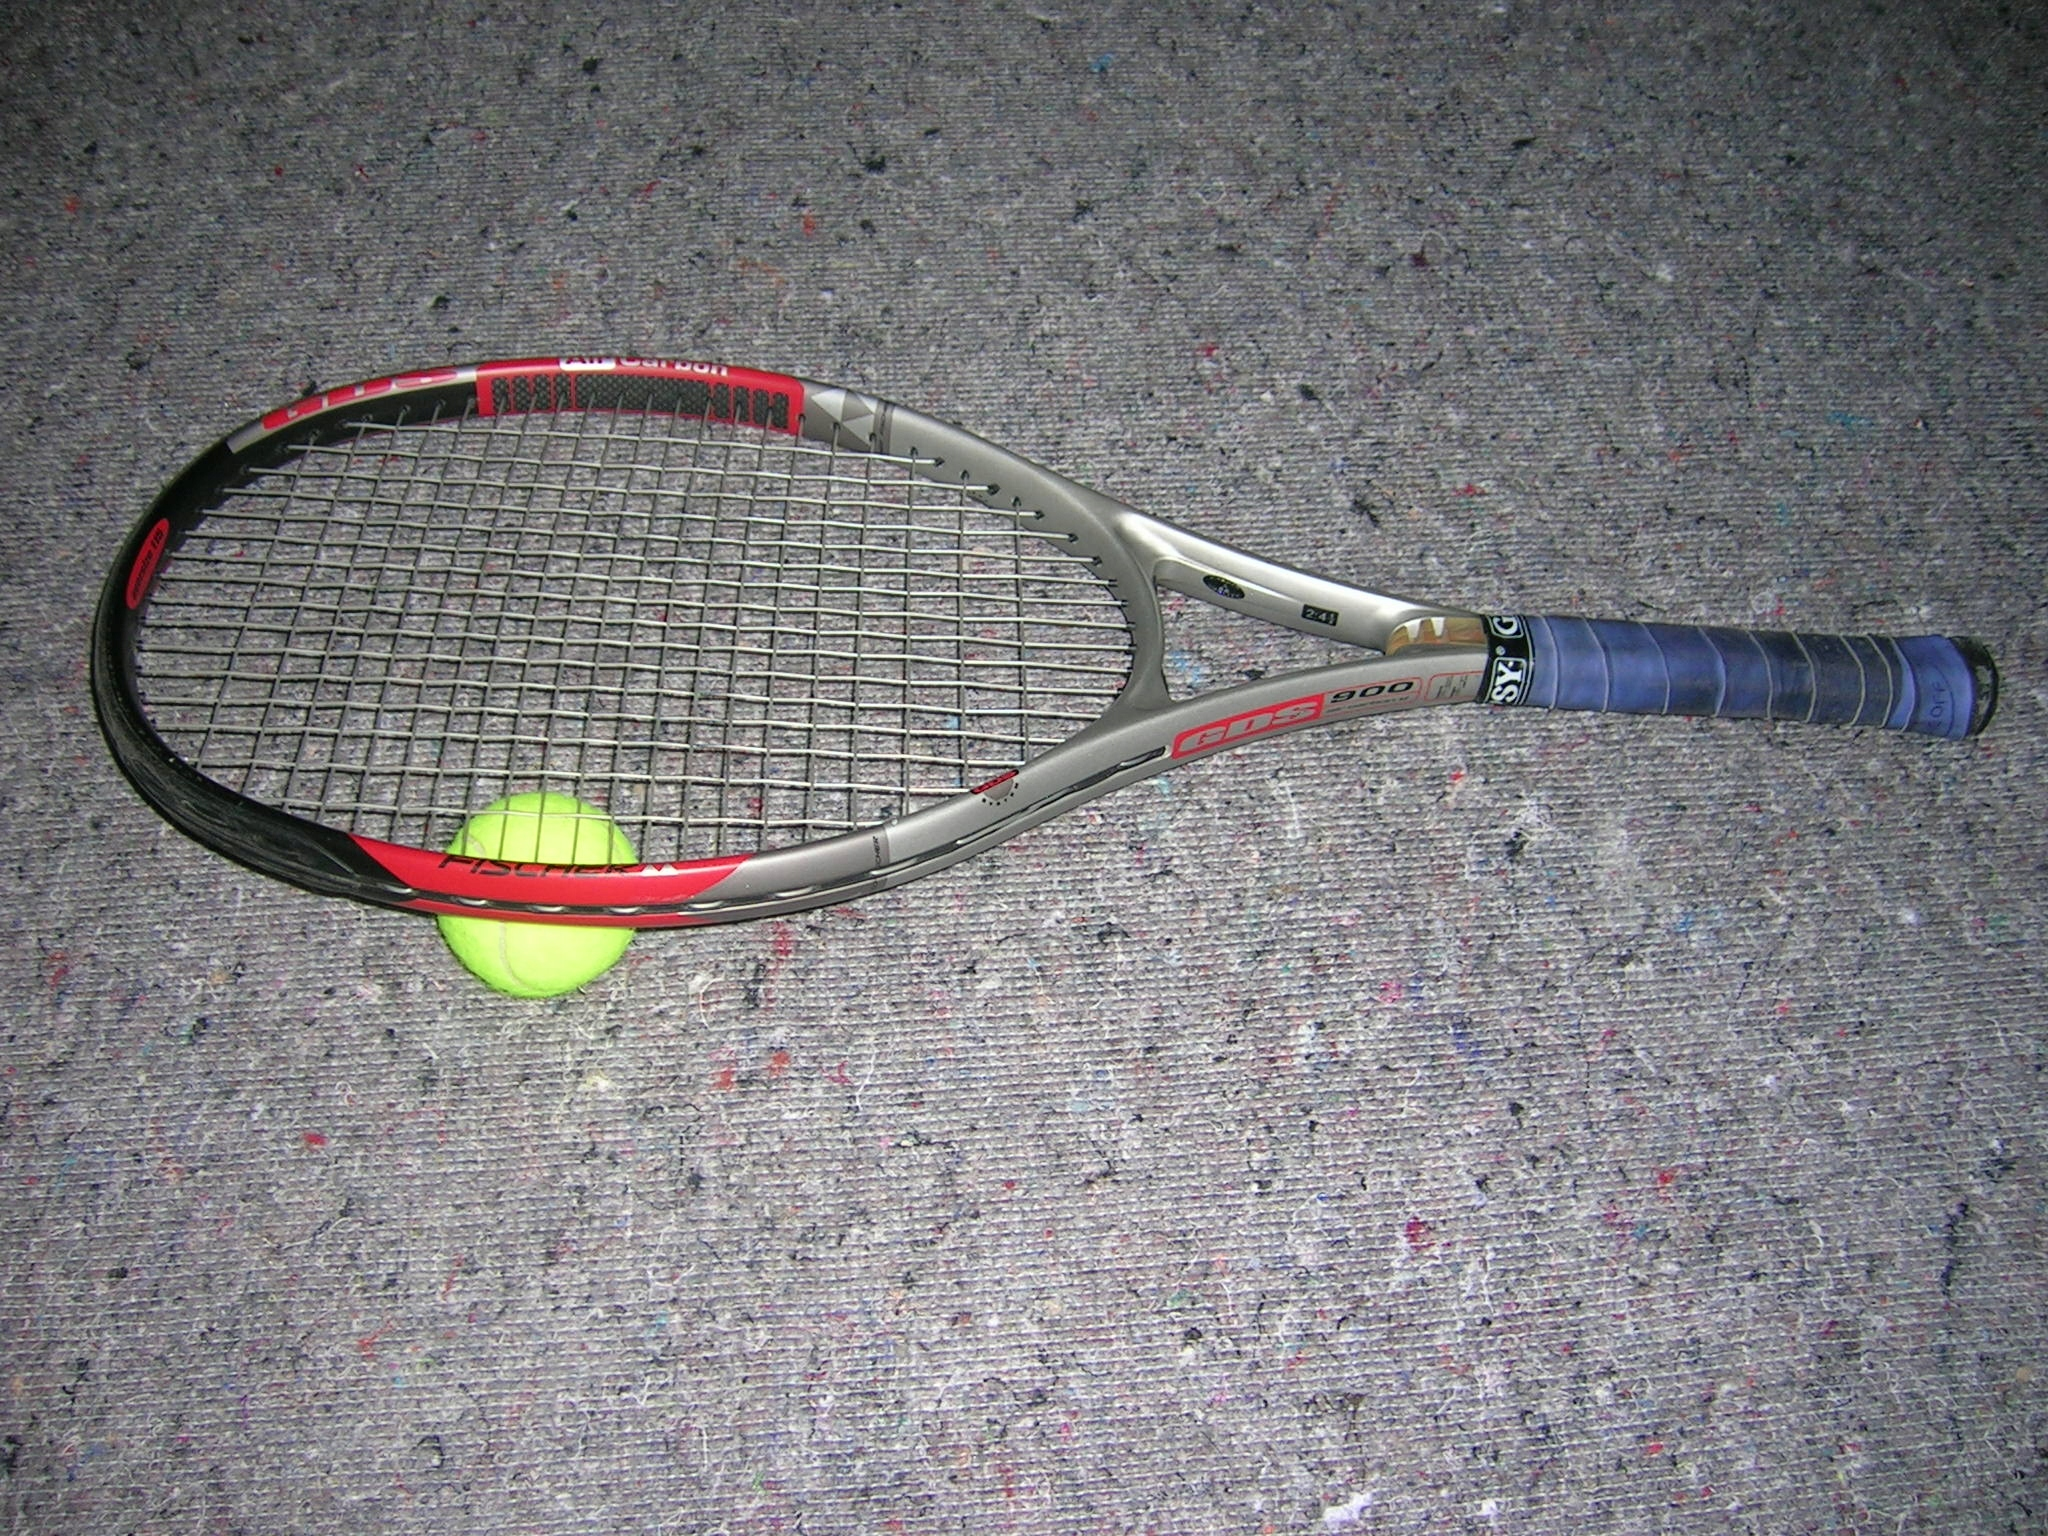 Rakieta tenisowa FISCHER REVOLUTION GDS 900